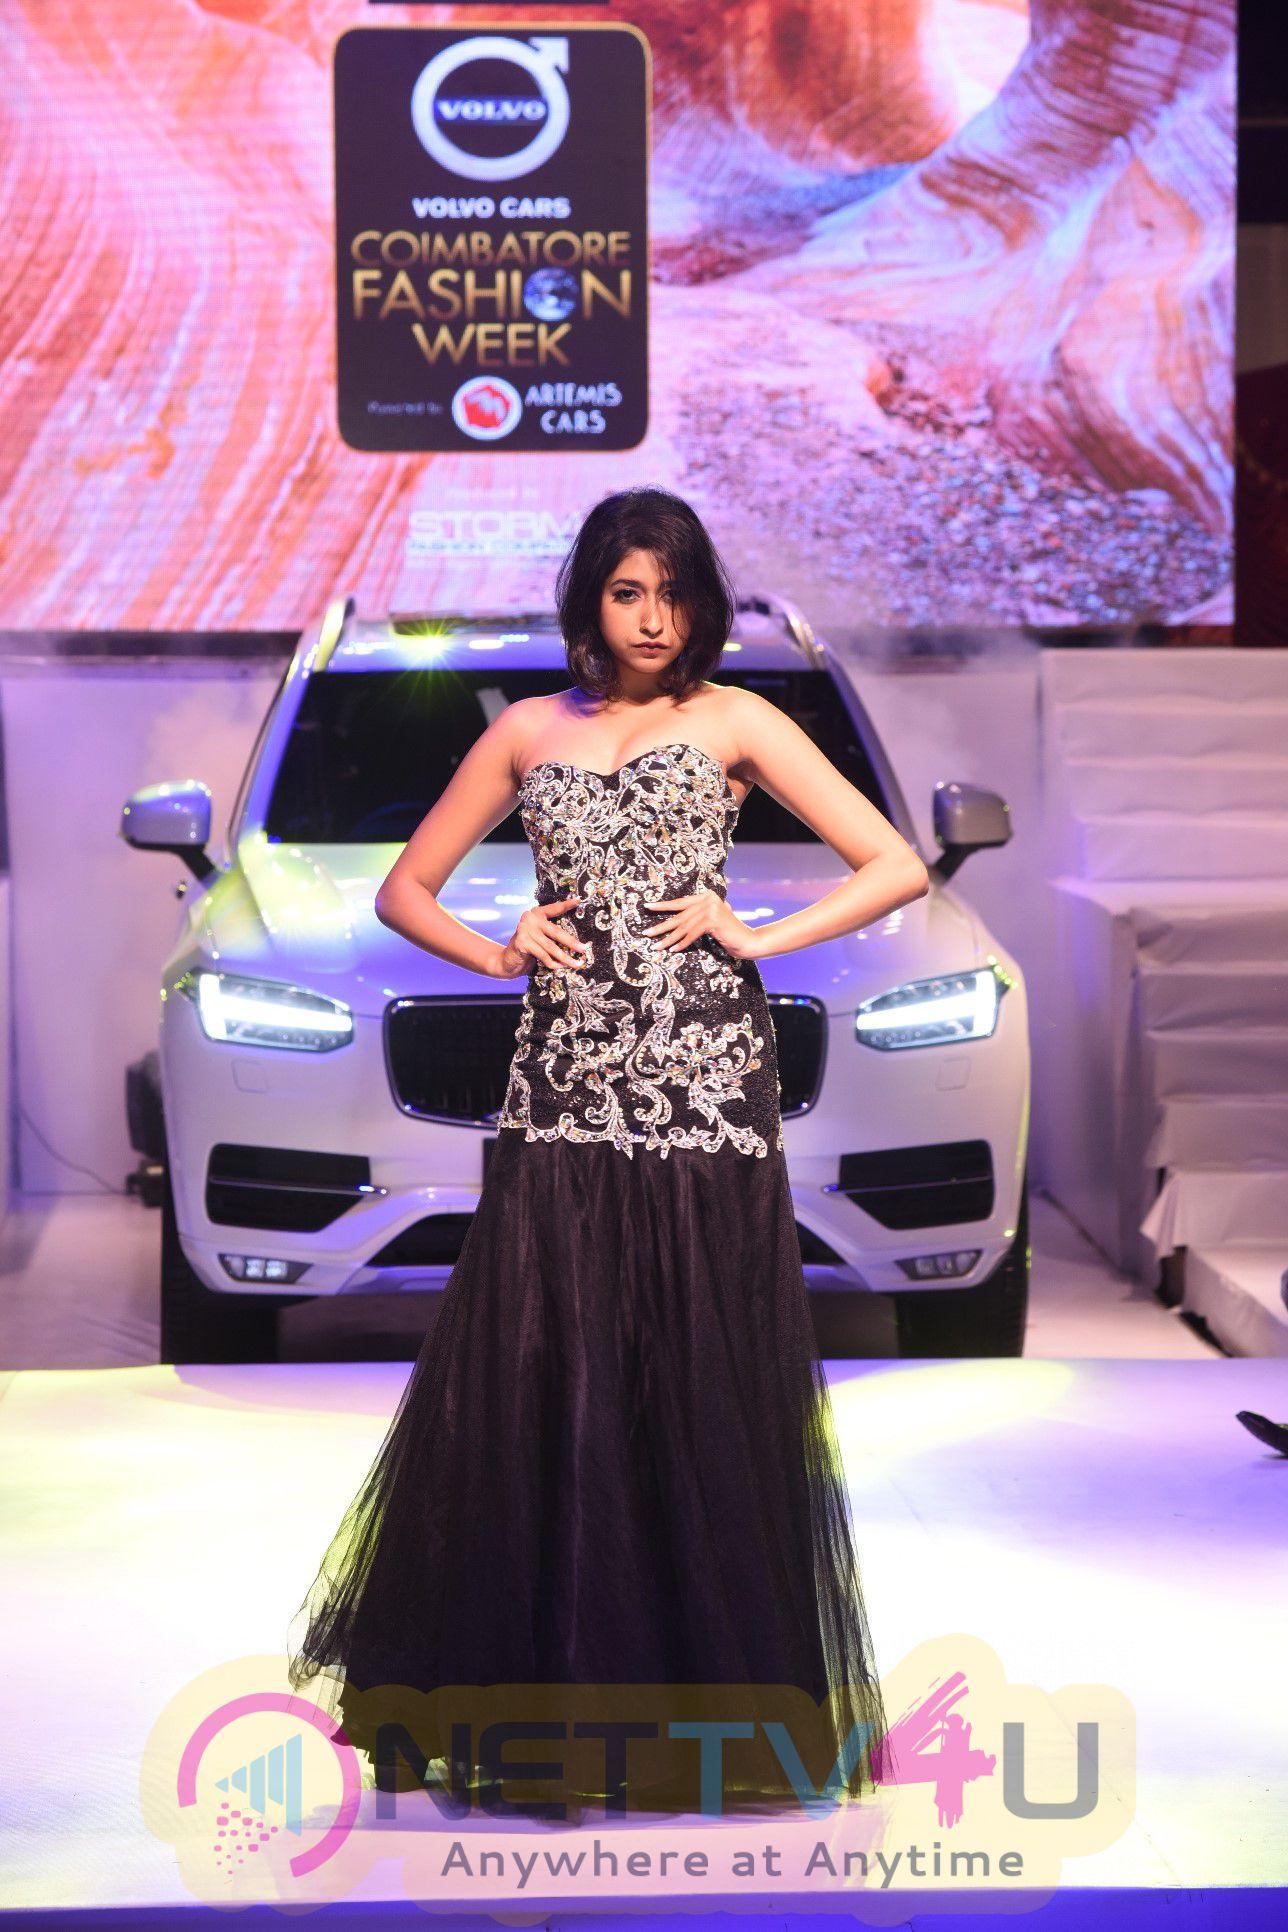 Volvo Cars Coimbatore Fashion Week 2016 Stills